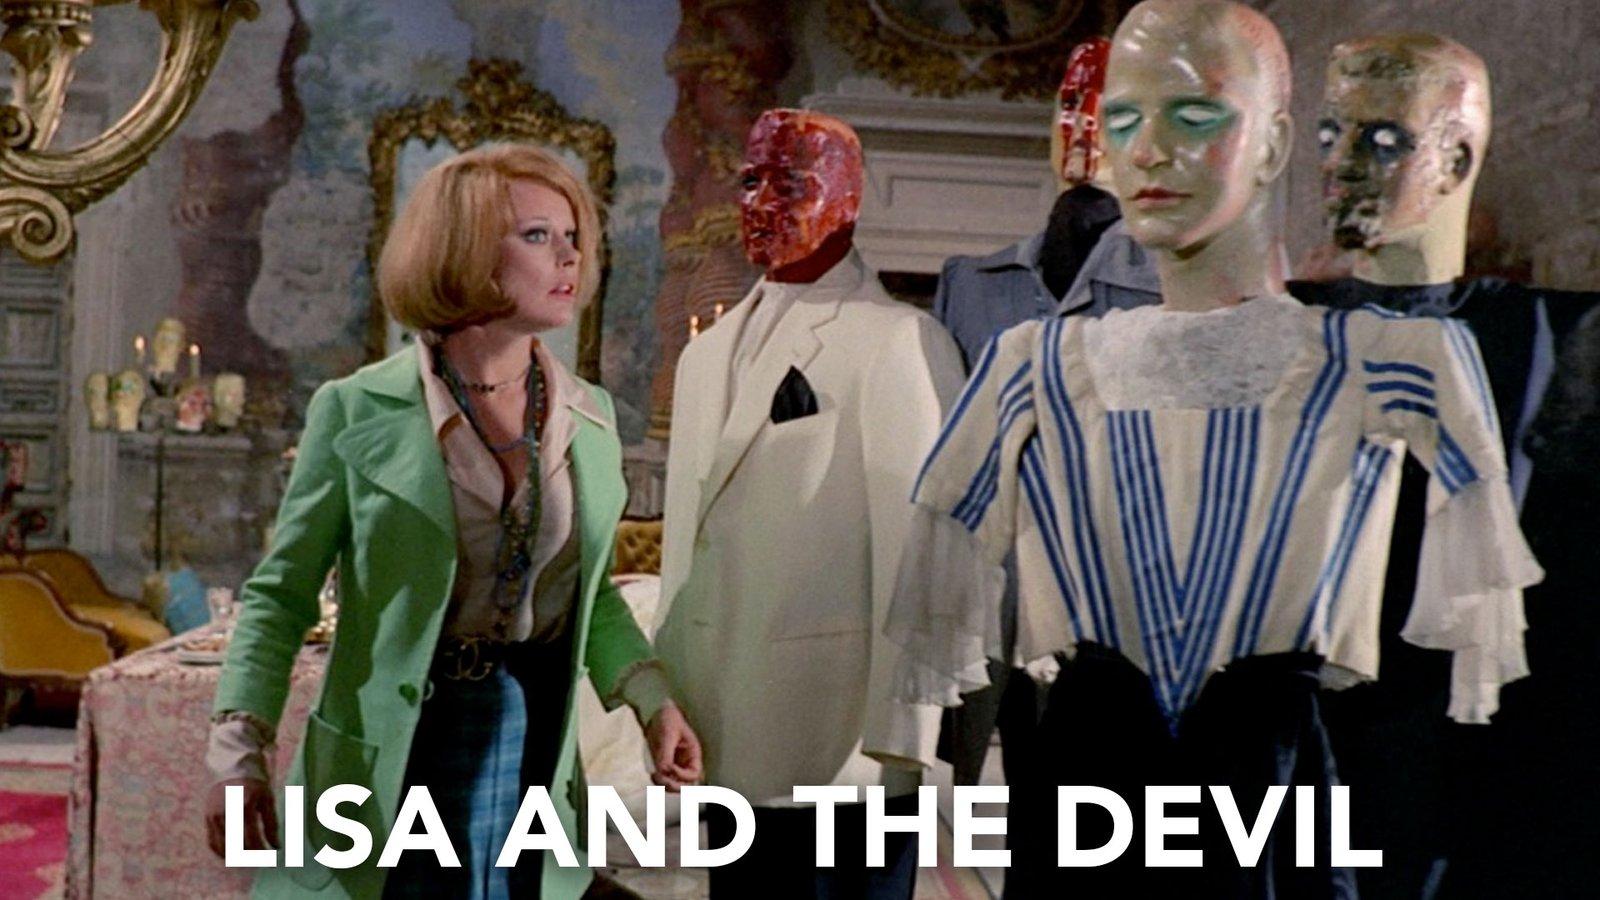 Lisa And The Devil - Lisa e il diavolo